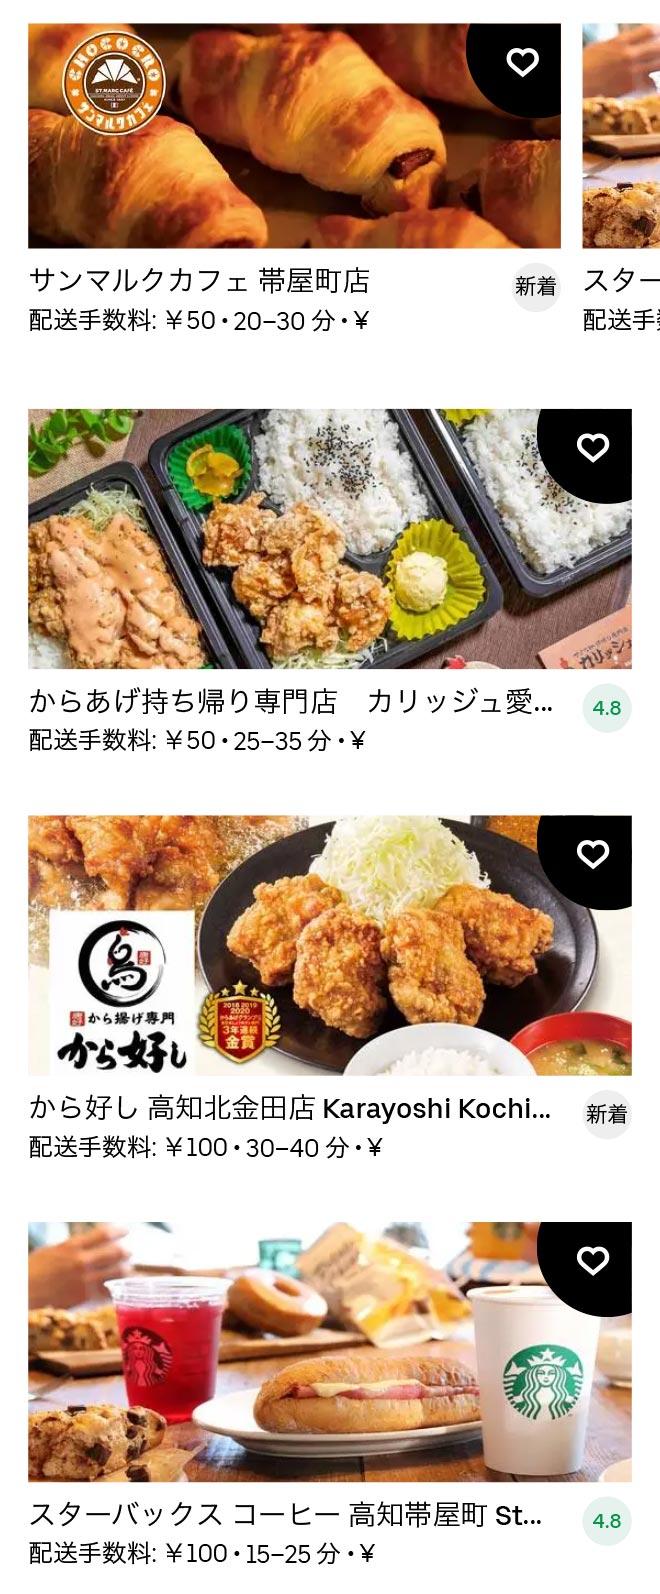 U kouchi 2103 02